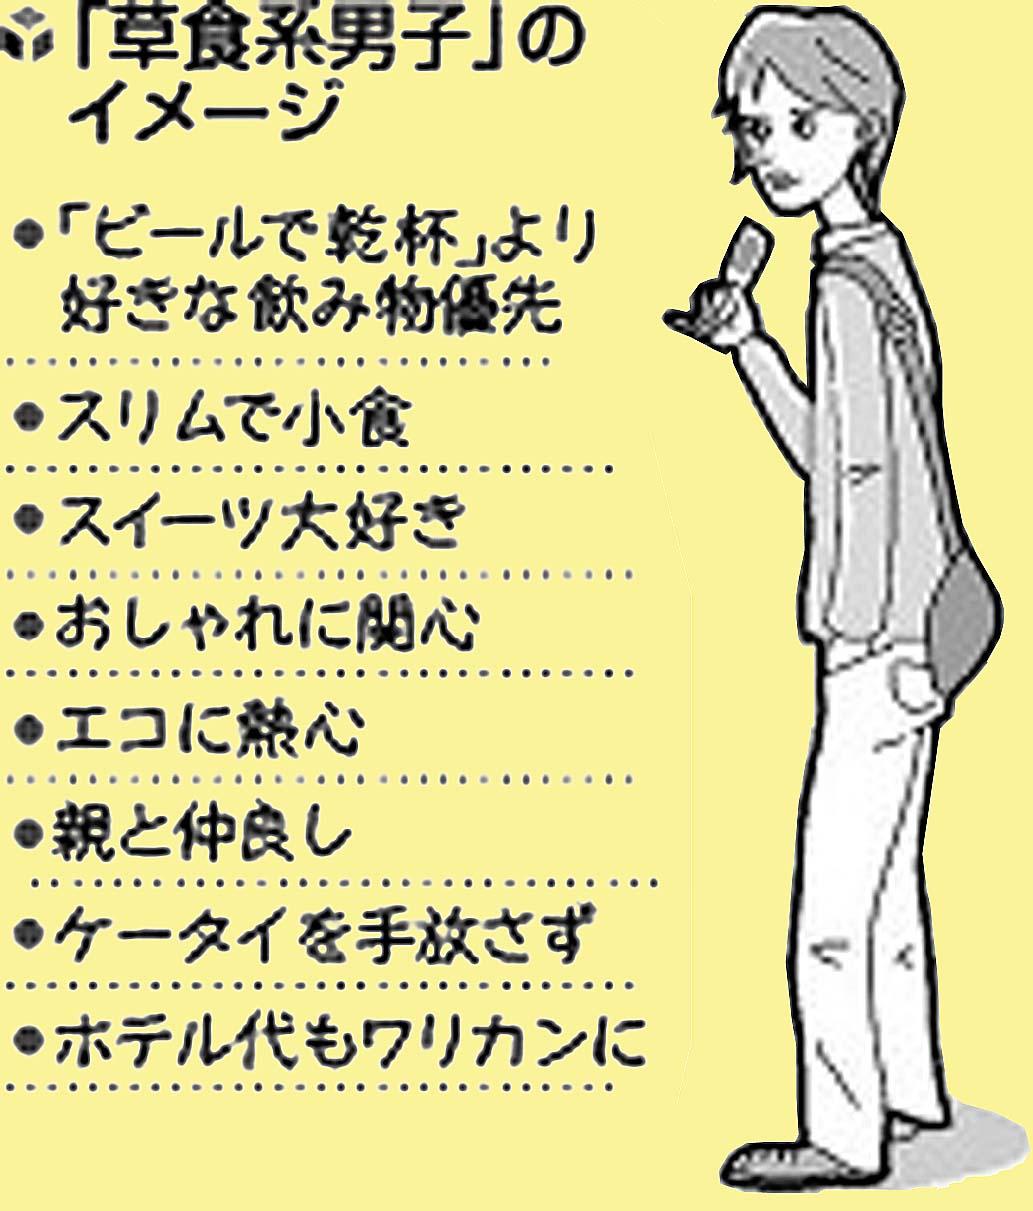 souhsokukei 最近(去年くらいから?)、よく耳にする単語に「草食系男子」があります。気